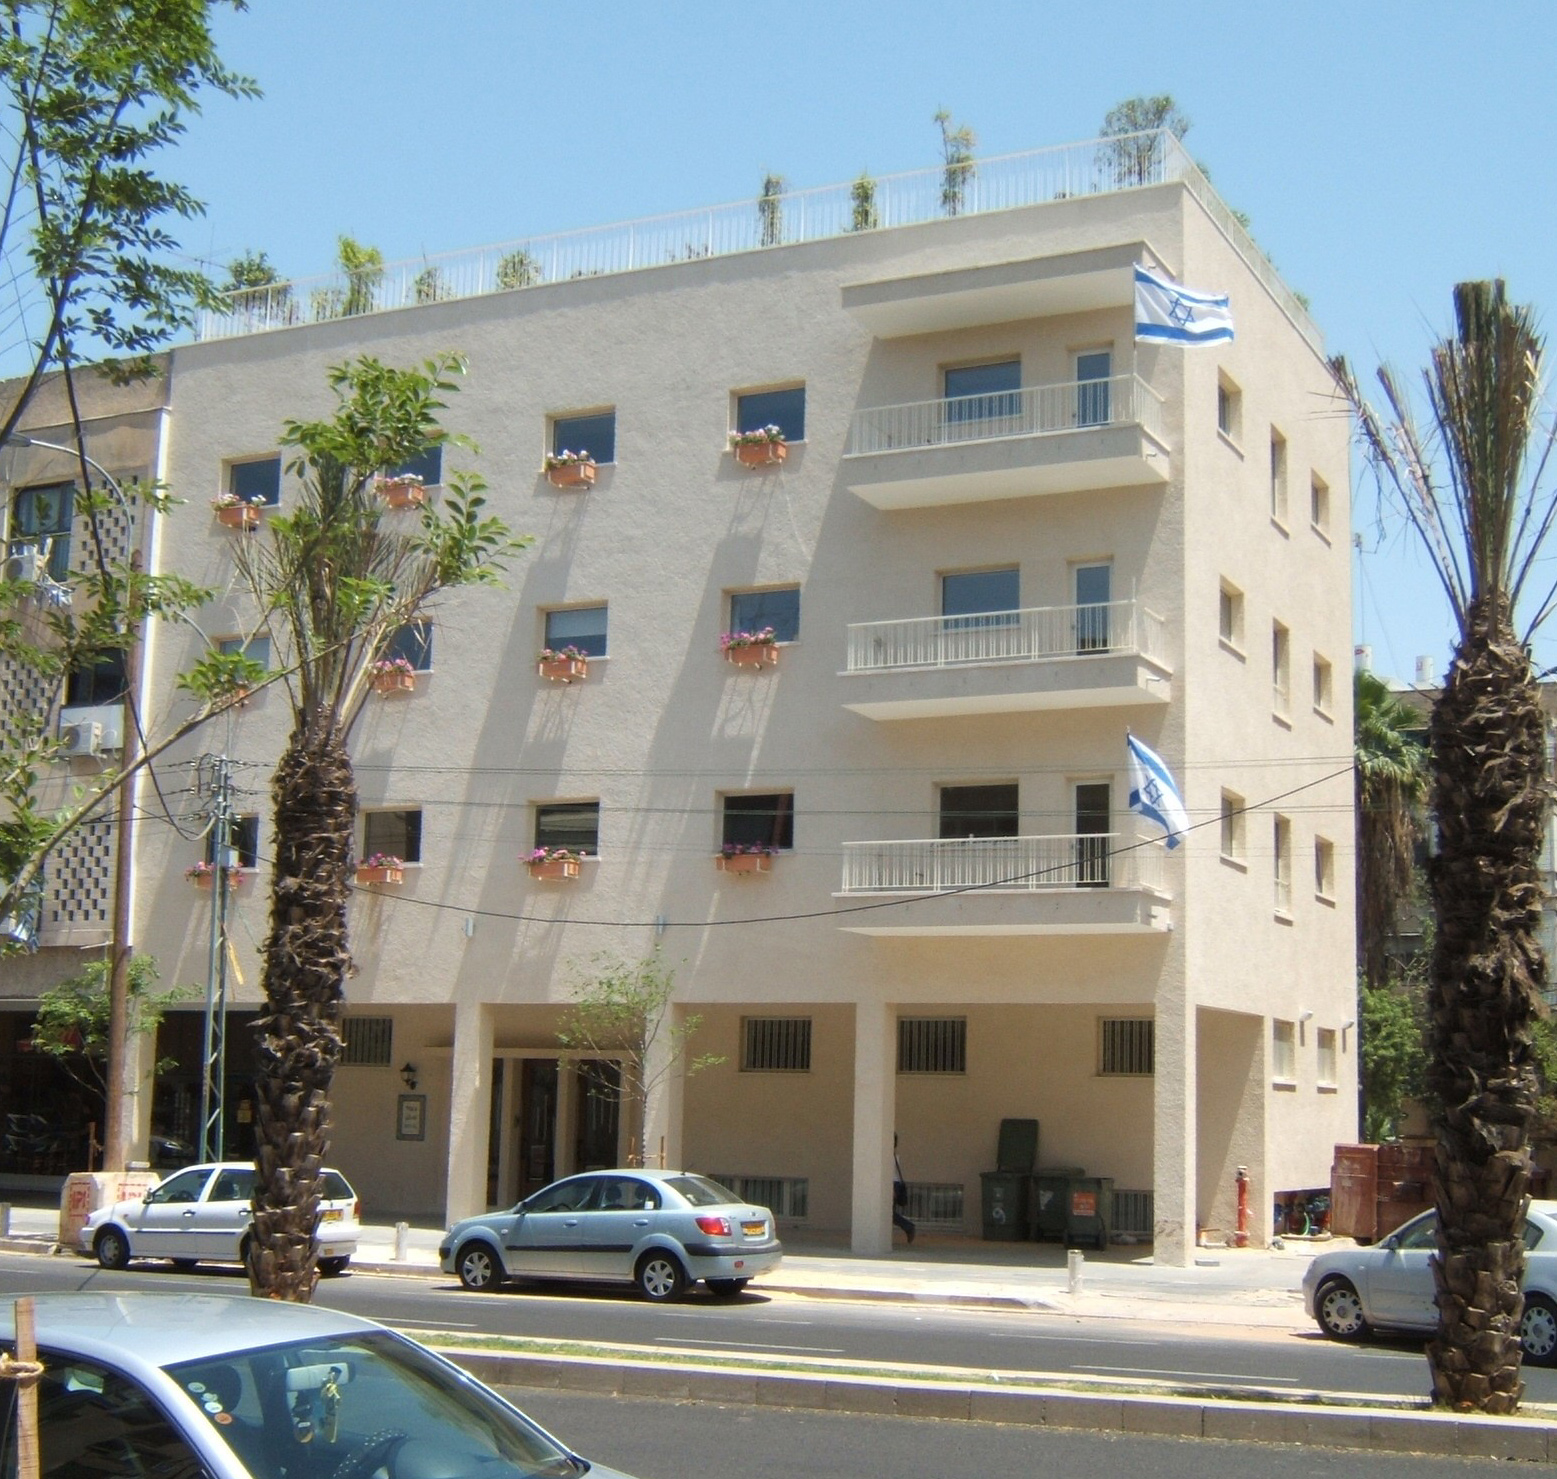 Israeli Bauhaus Architecture: History, Photos, Styles \u0026 Designs at ...